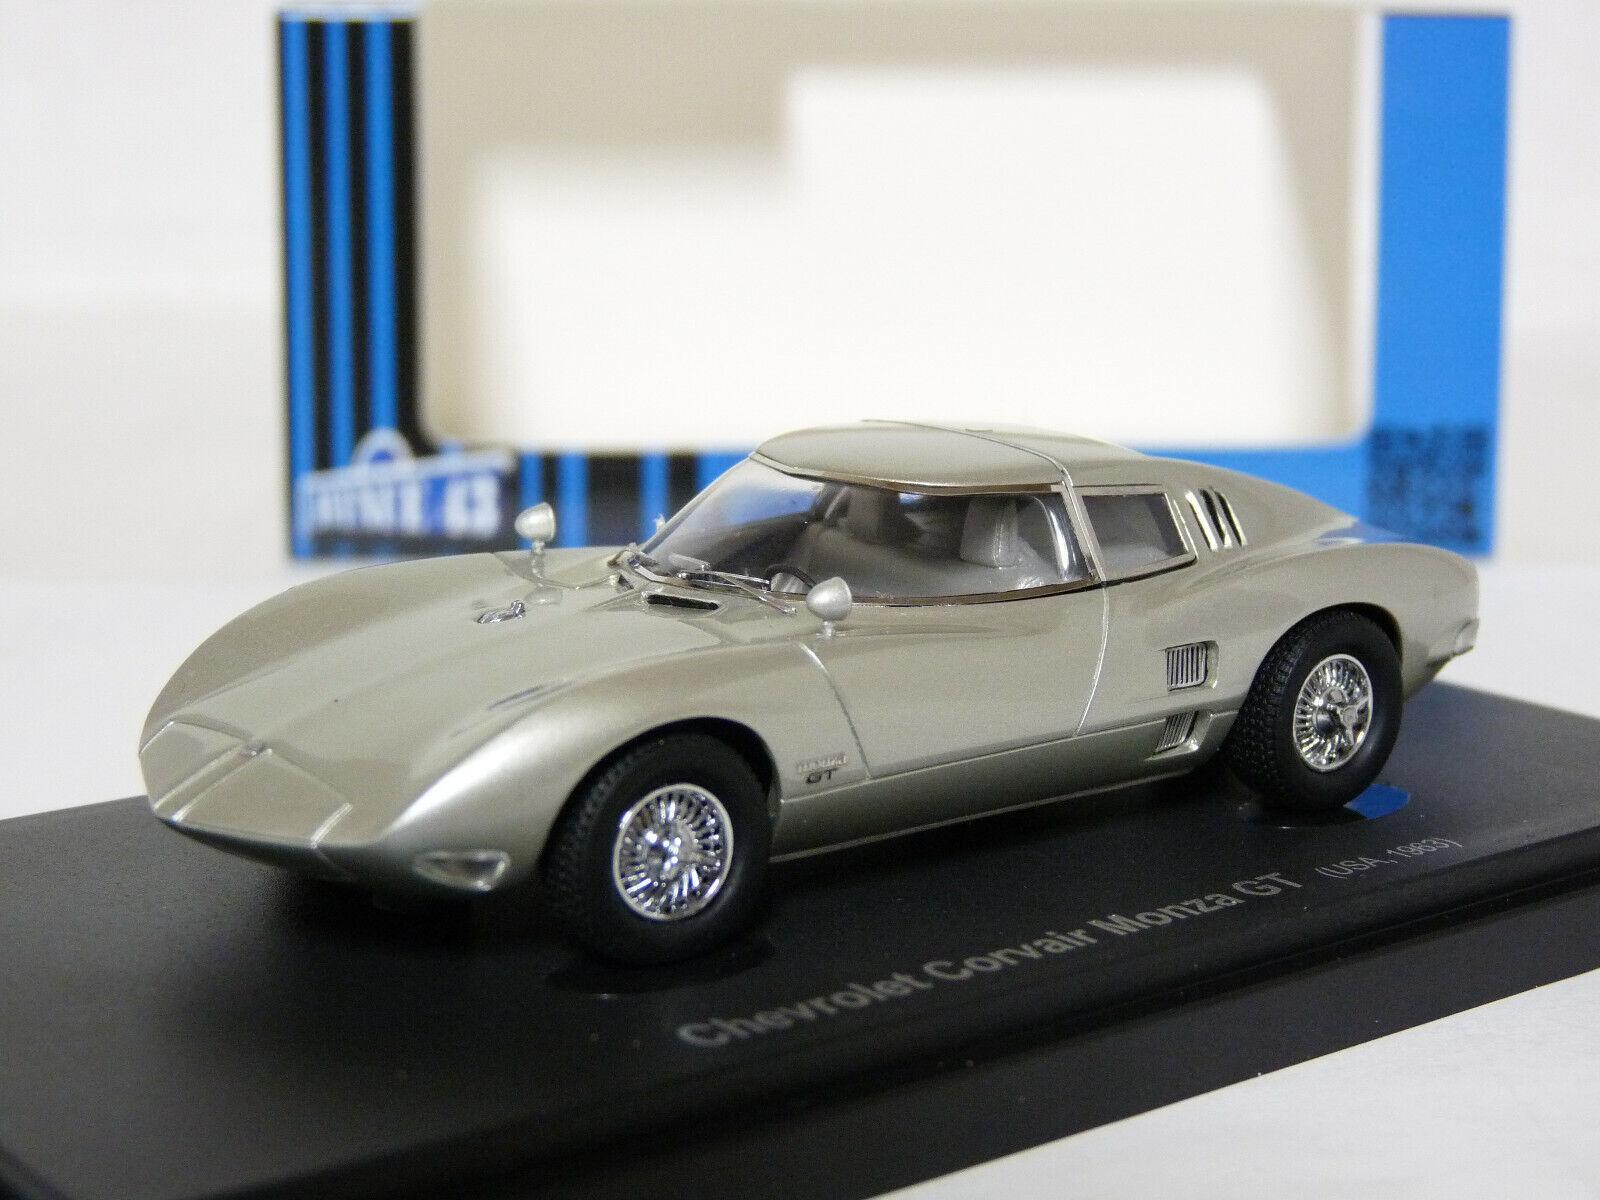 Avenue 43 60022 1 43 1962 Chevrolet Corvair Monza GT Concept Resin Model Car